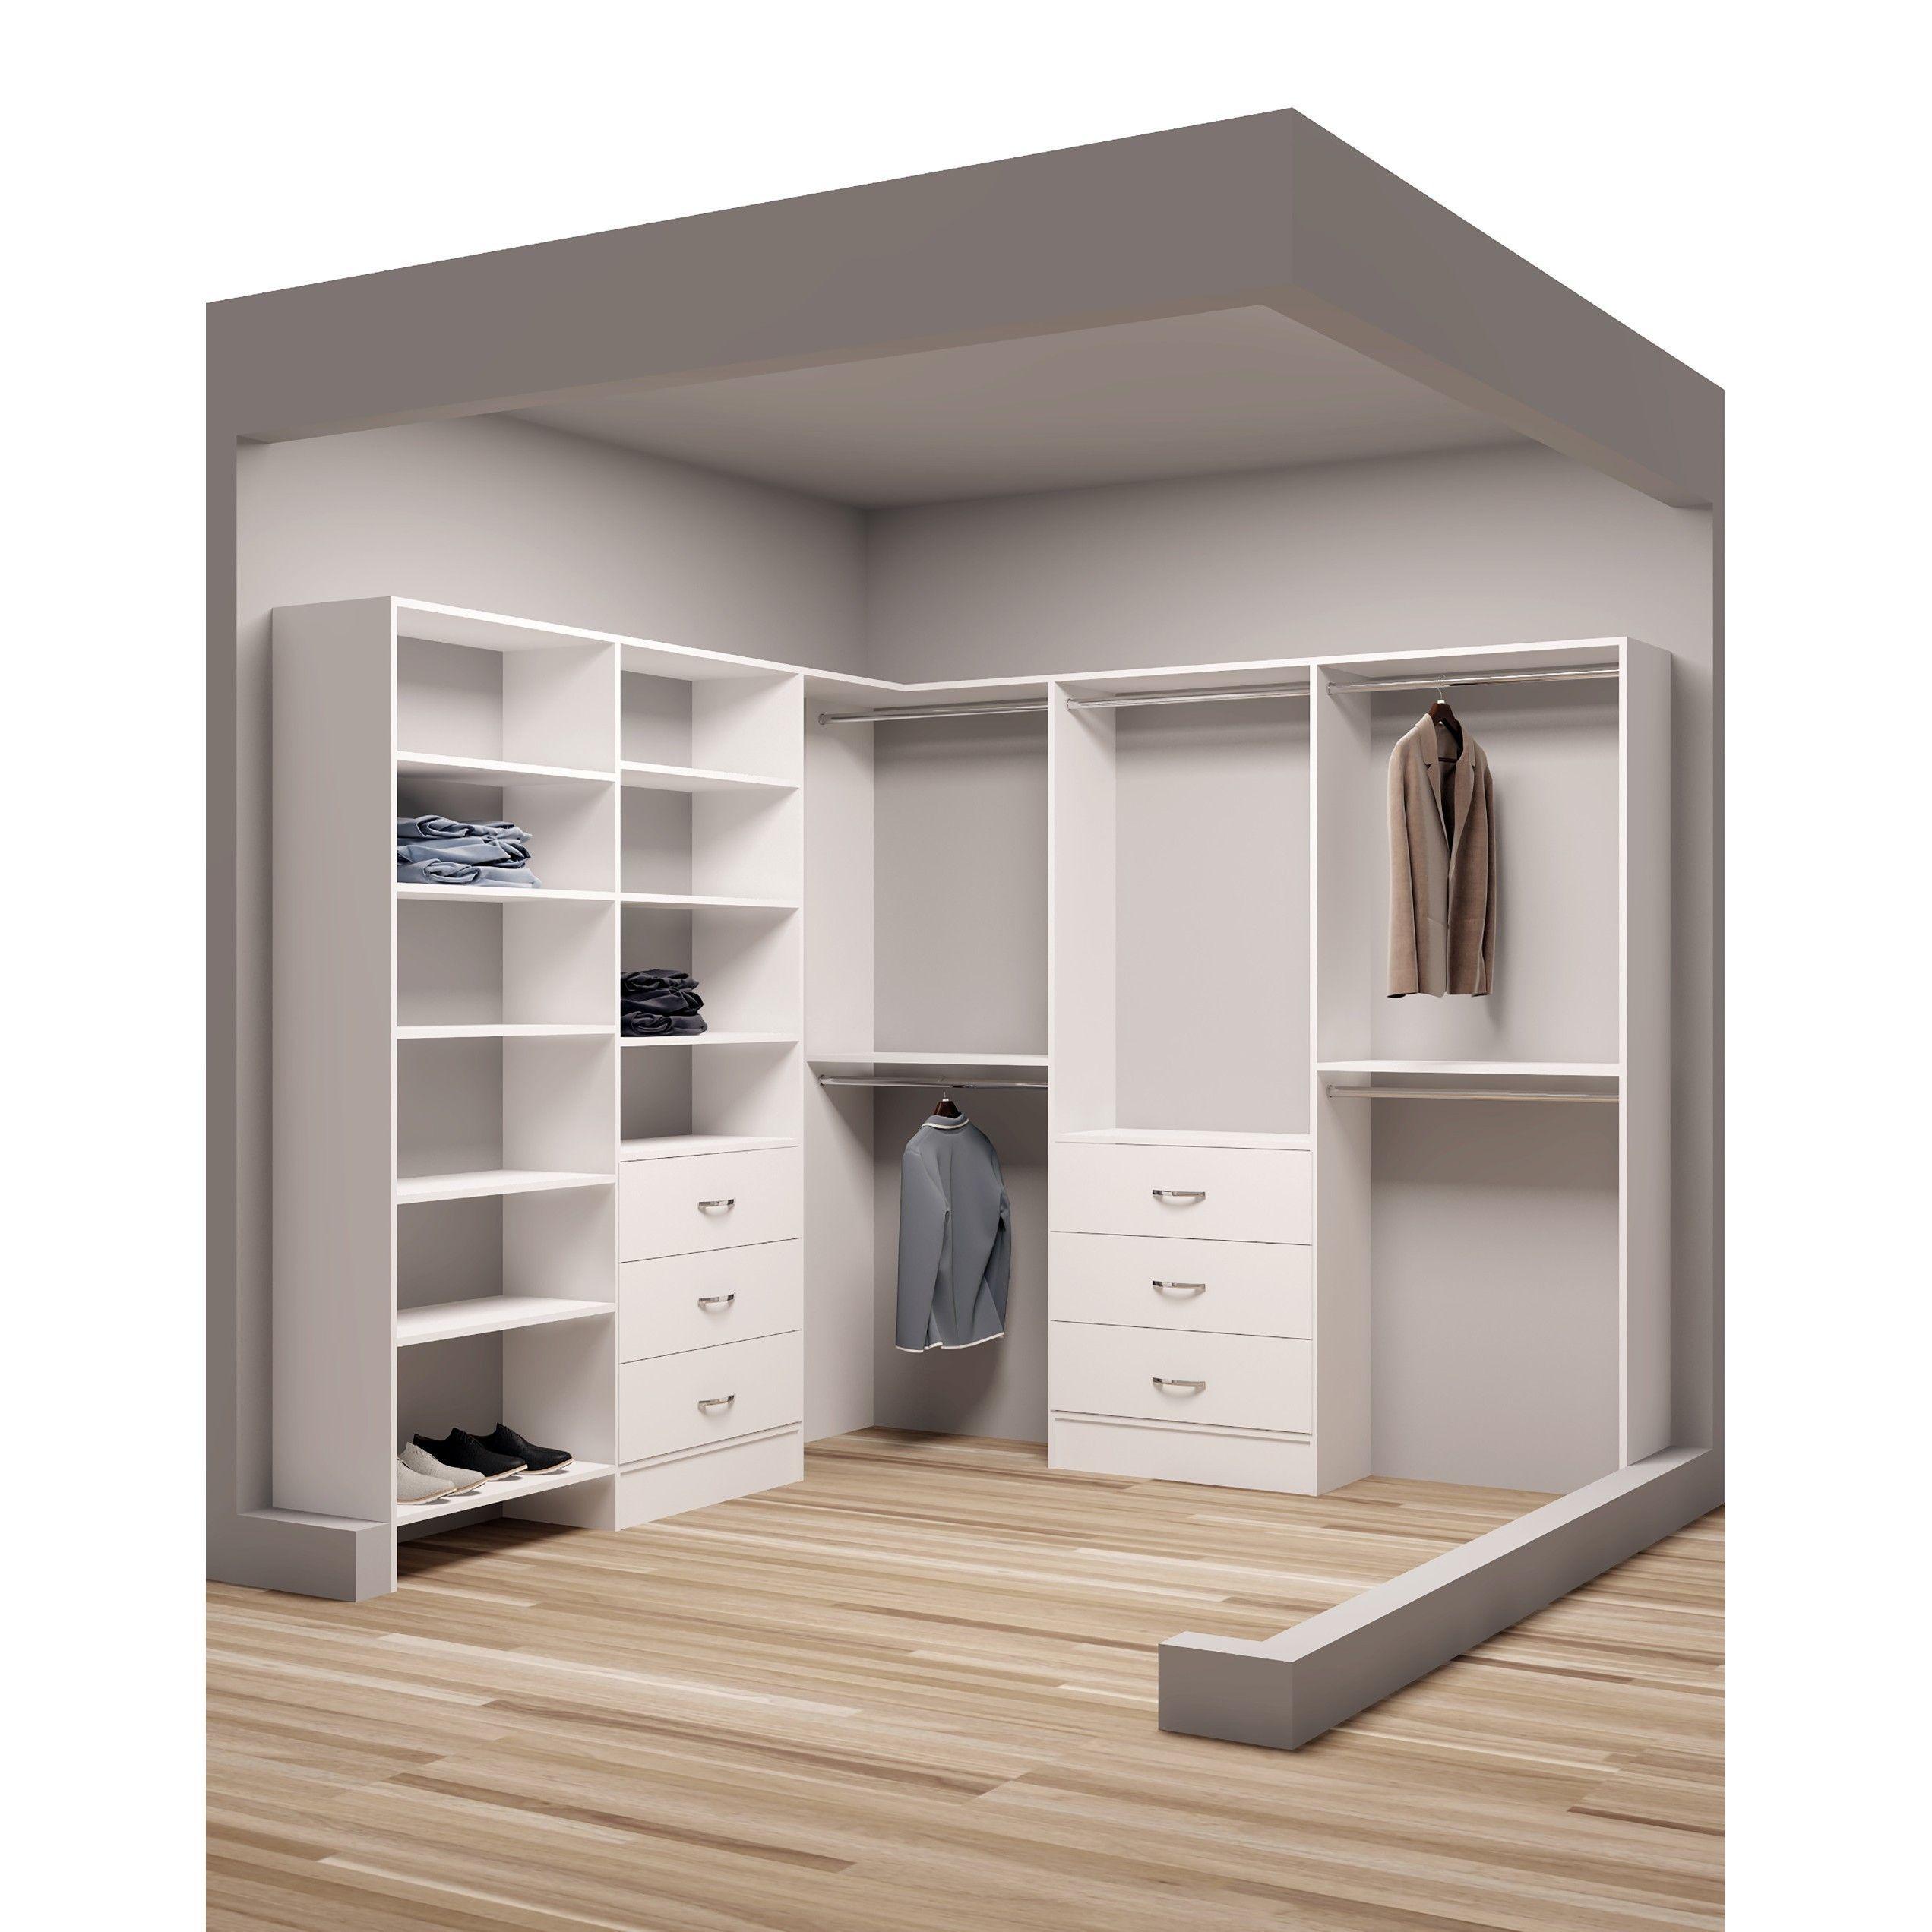 Nice Corner Closet Shelving. Tidysquares Classic White Wood 93 X 96 Corner  Walkin Closet Organizer Design